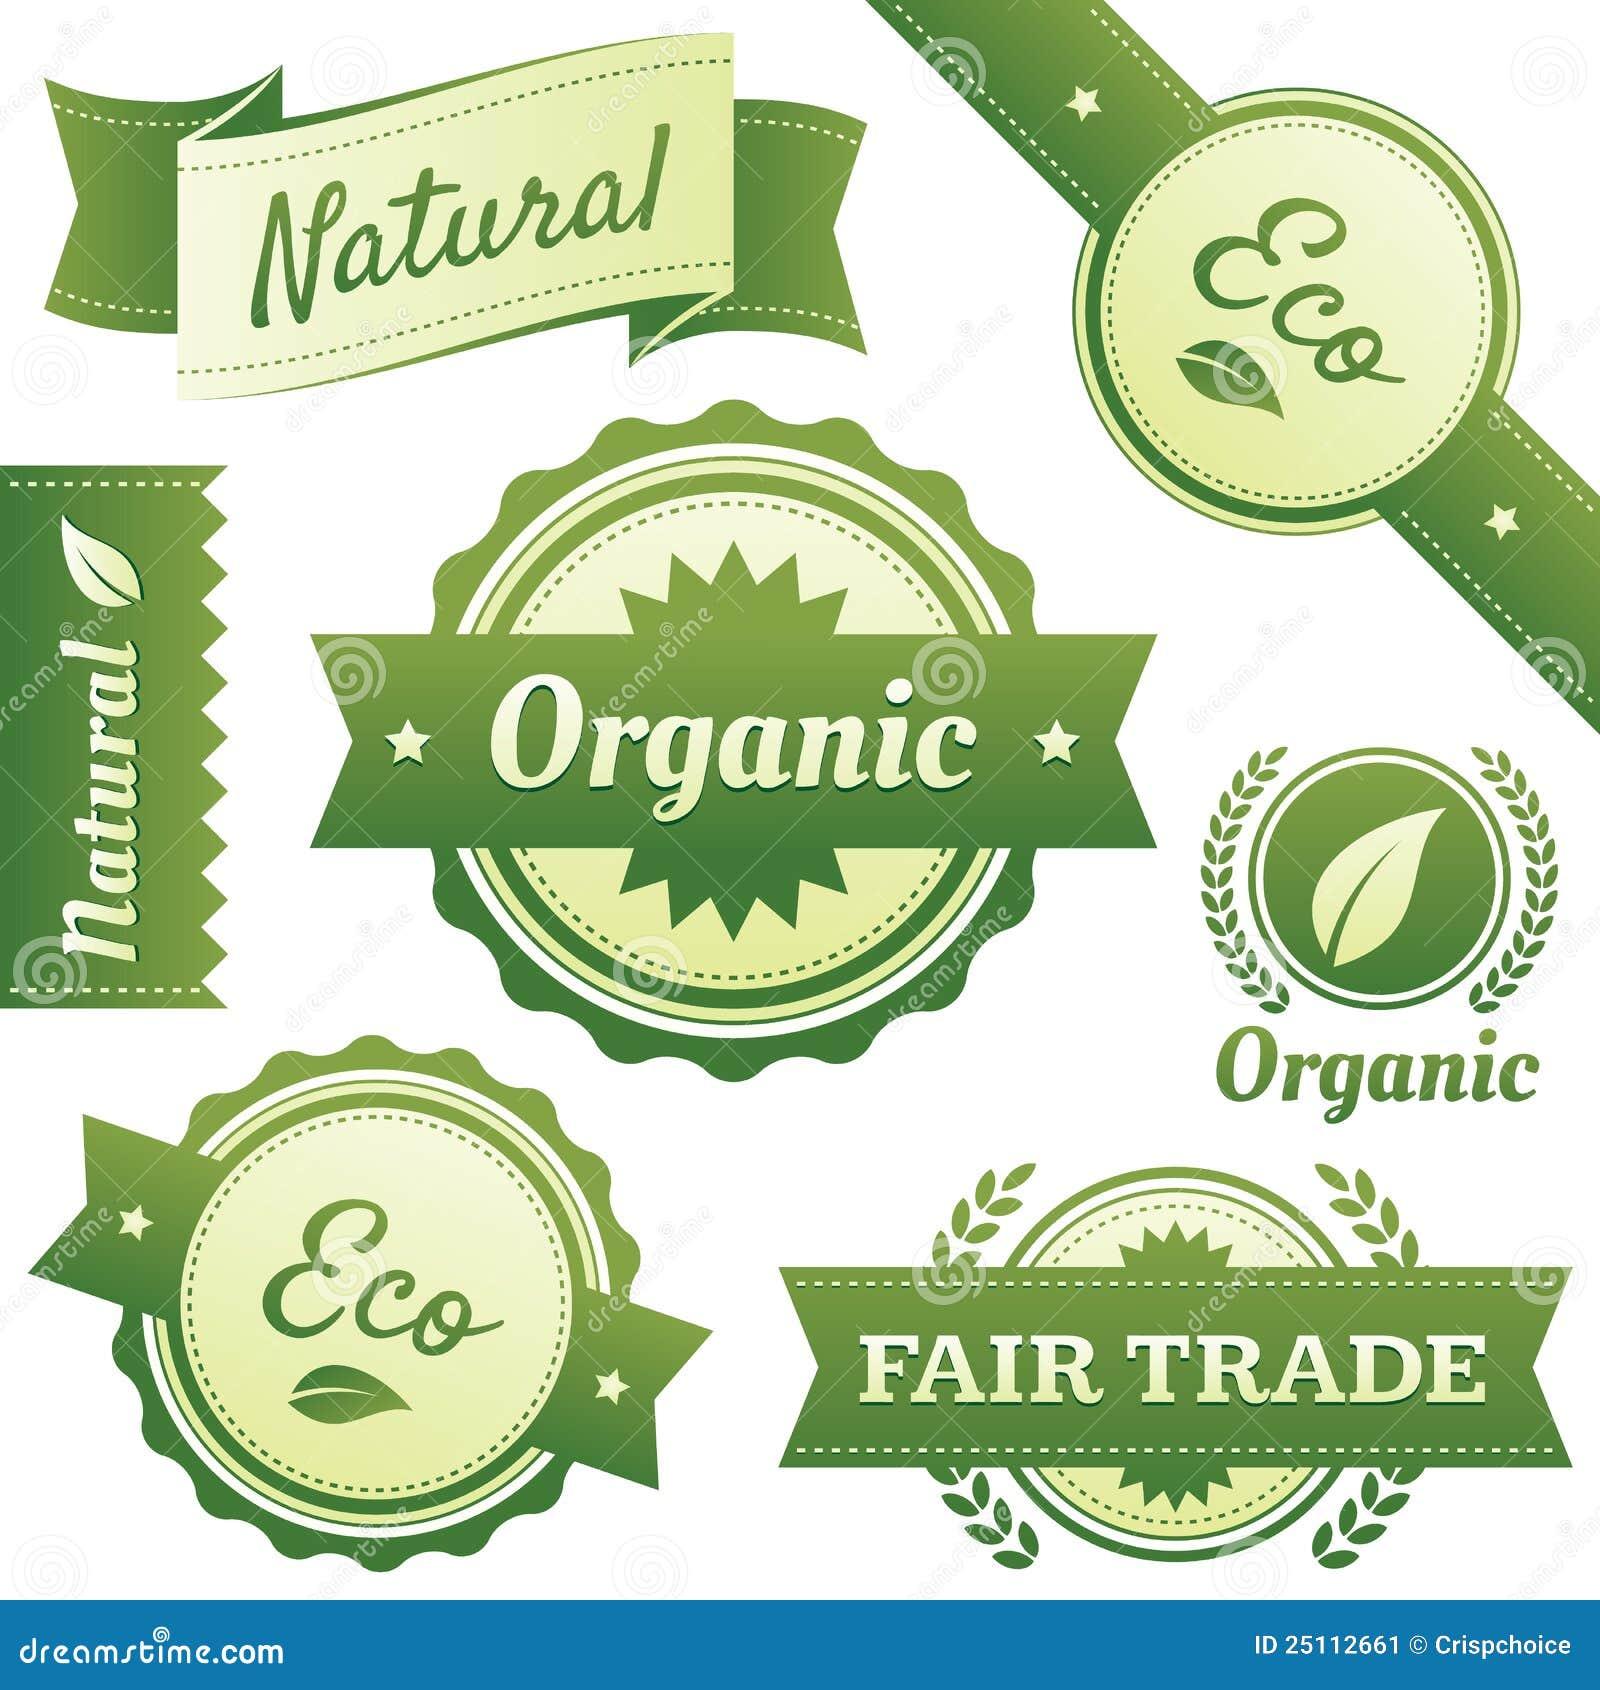 All Natural Organic Grown Logo